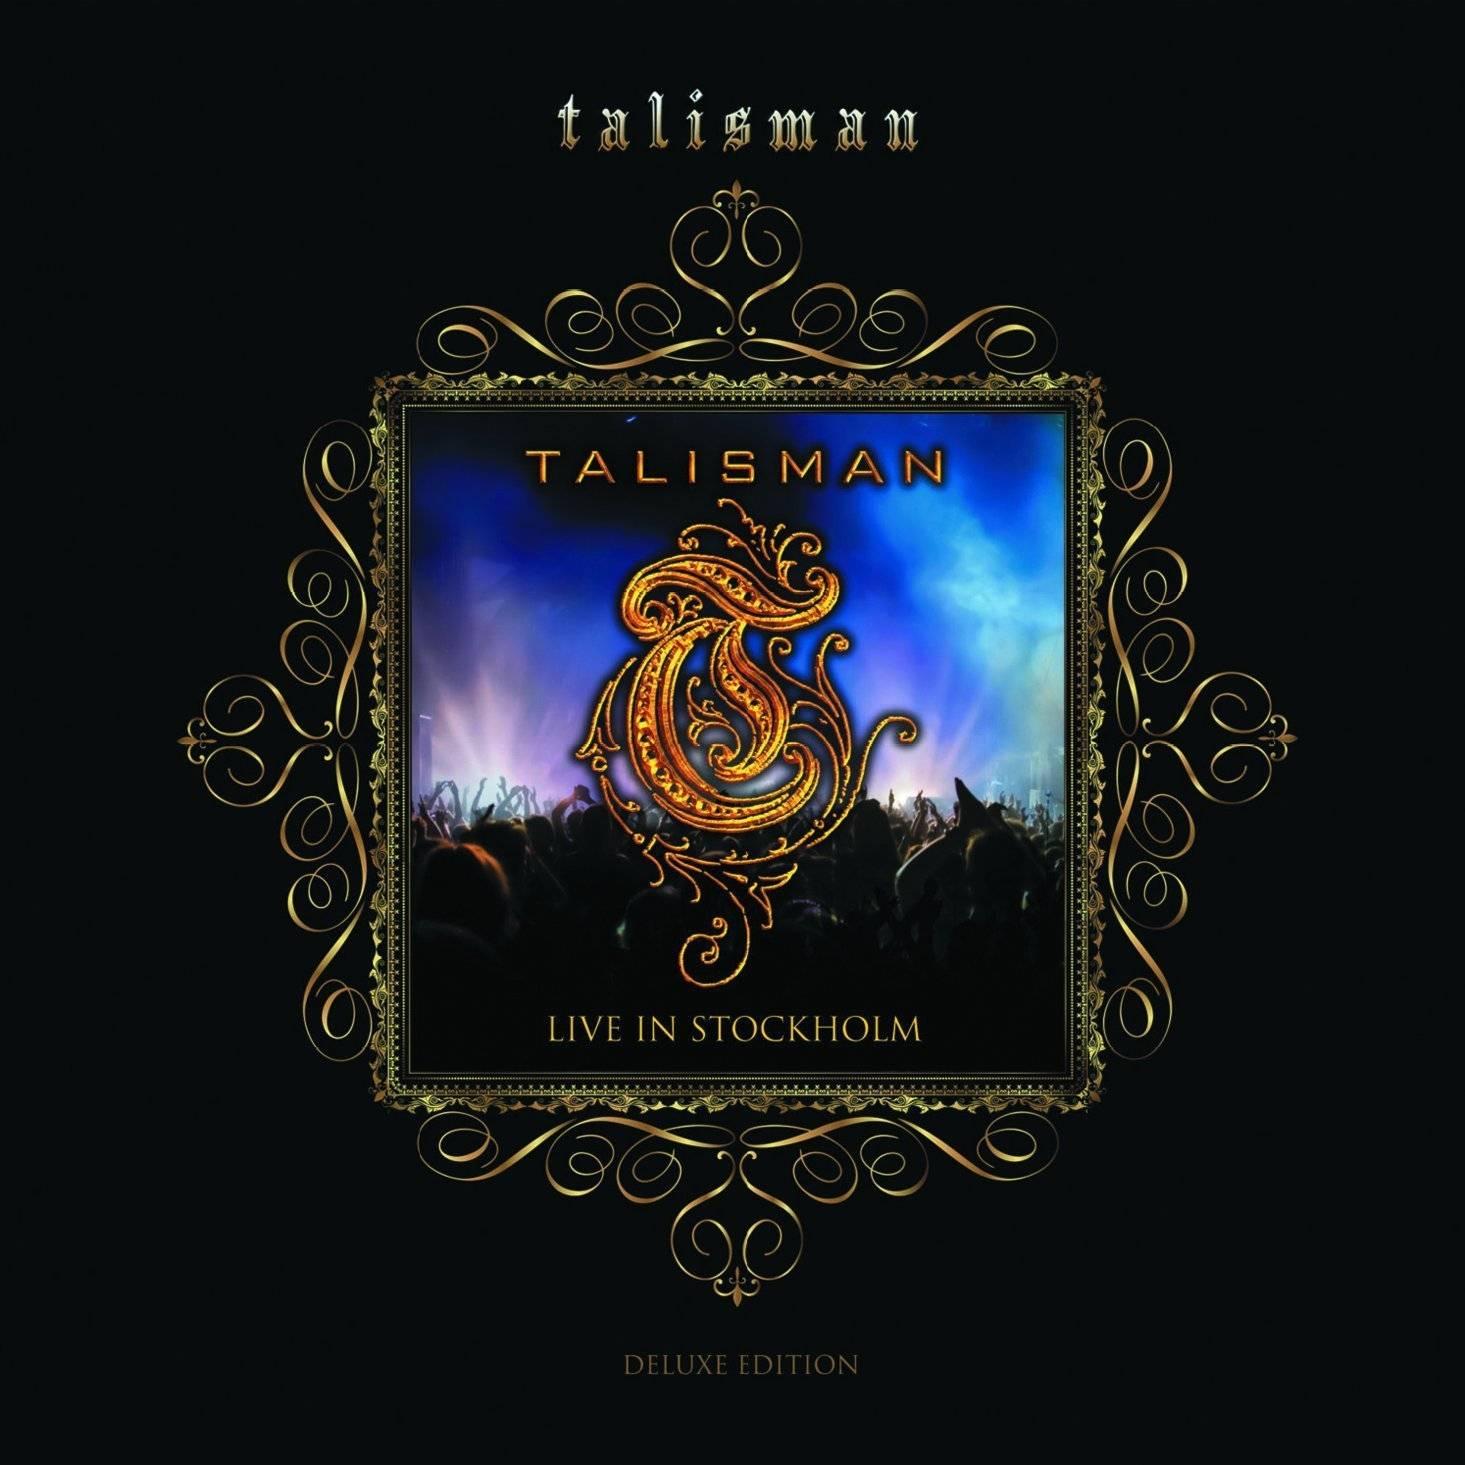 Talisman Live in Stockholm